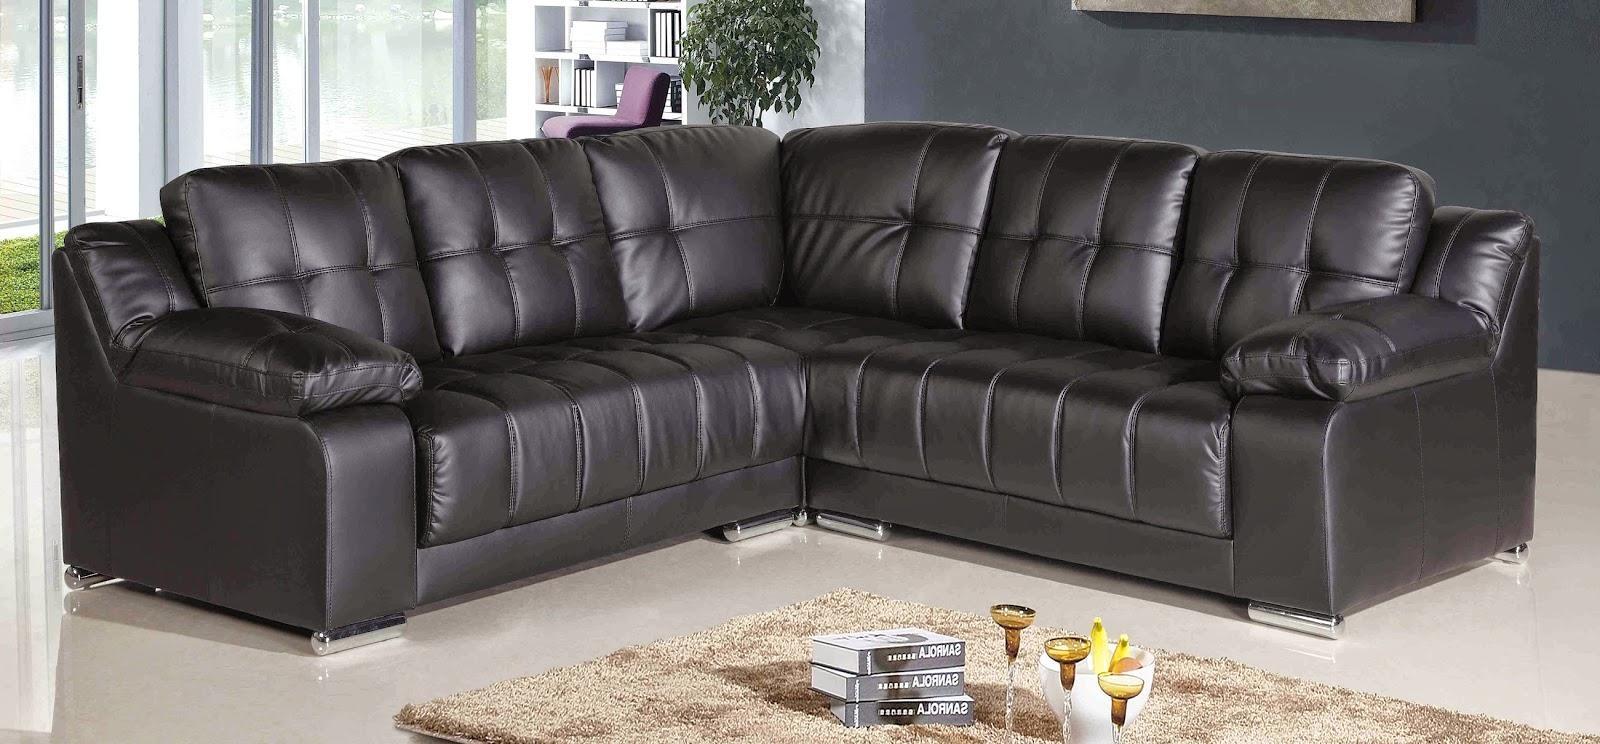 20 photos cheap corner sofa bed sofa ideas. Black Bedroom Furniture Sets. Home Design Ideas